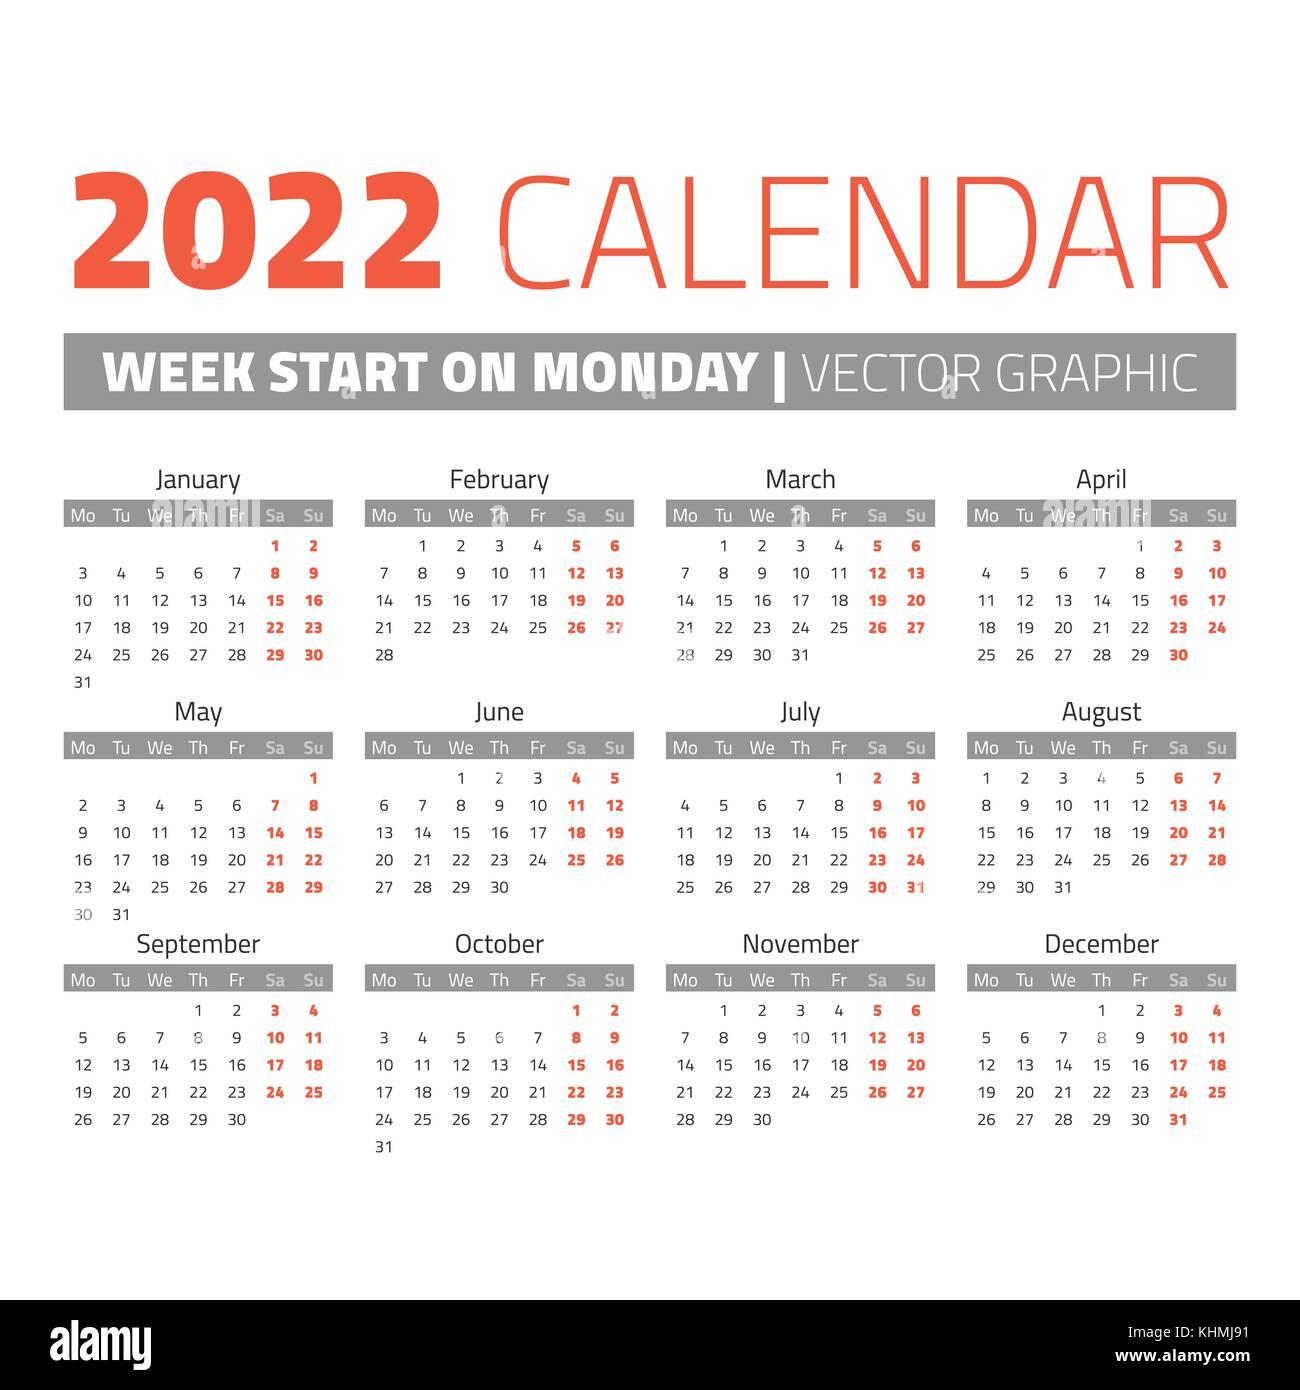 Cal Poly Calendar 2022.Simple 2022 Year Calendar Stock Vector Image Art Alamy